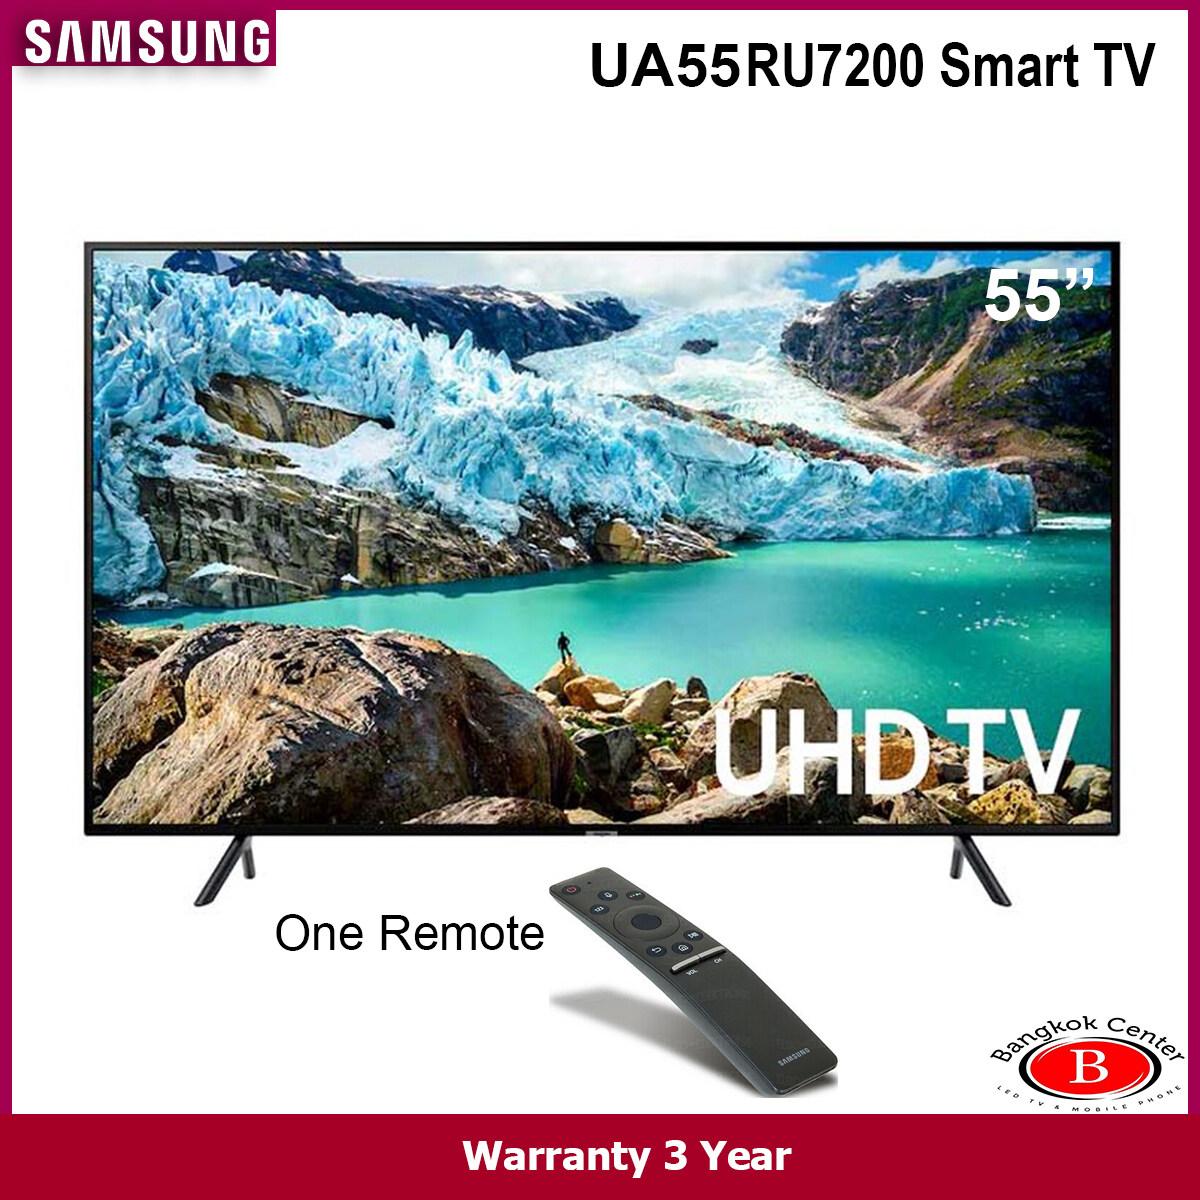 Samsung Smart 4k Uhd Tv Ru7200 ขนาด 55 นิ้ว รุ่น 55ru7200 รุ่นปี 2019.